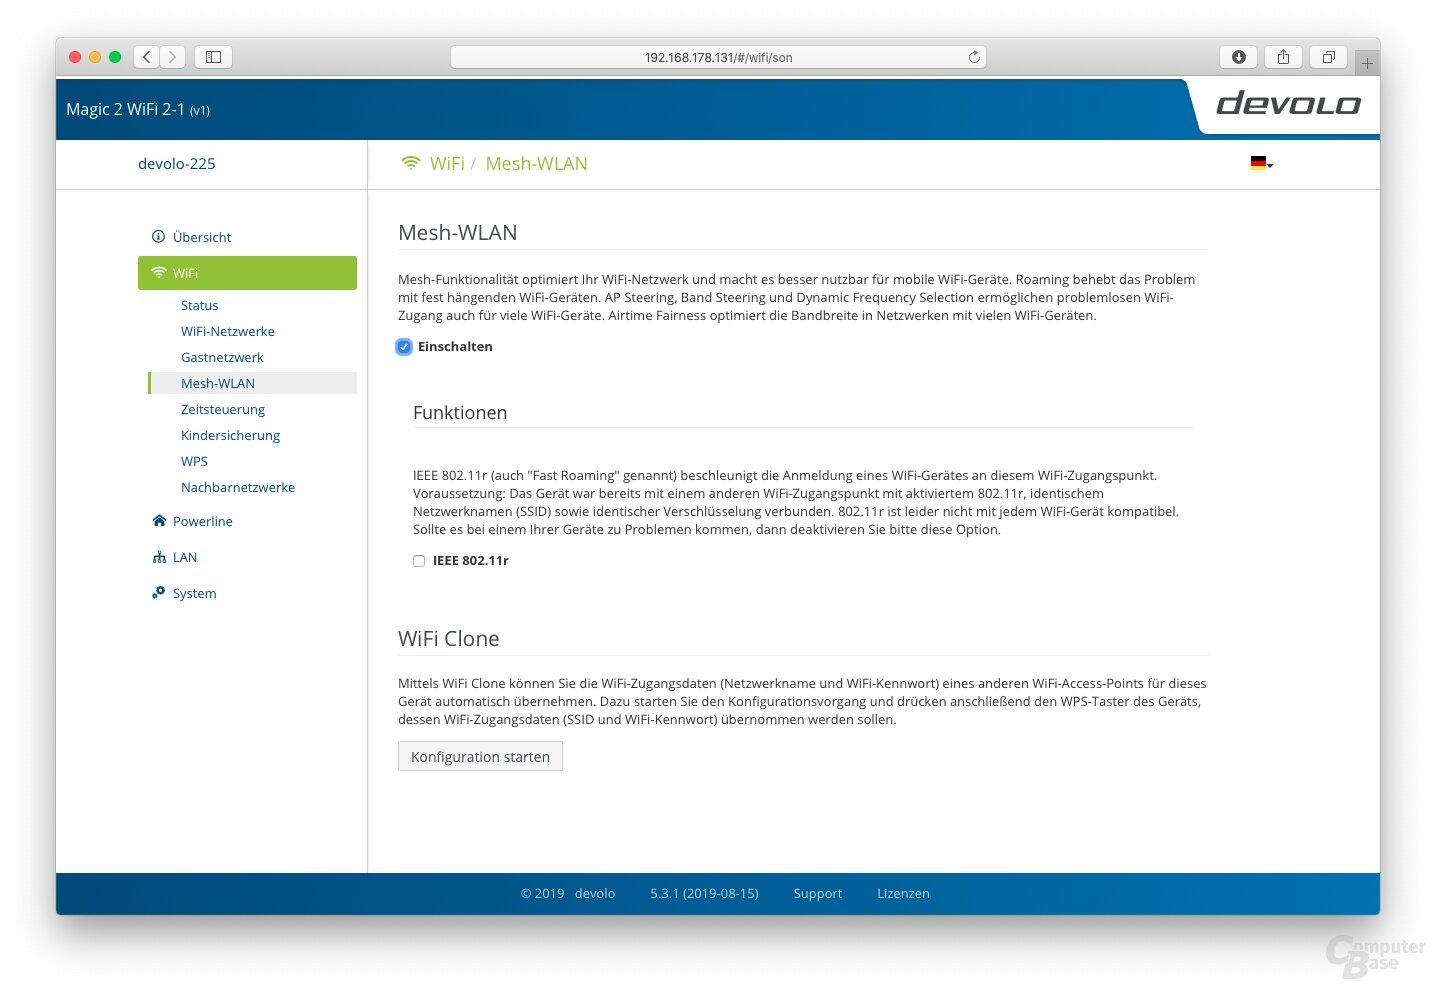 Devolo Web-Oberfläche